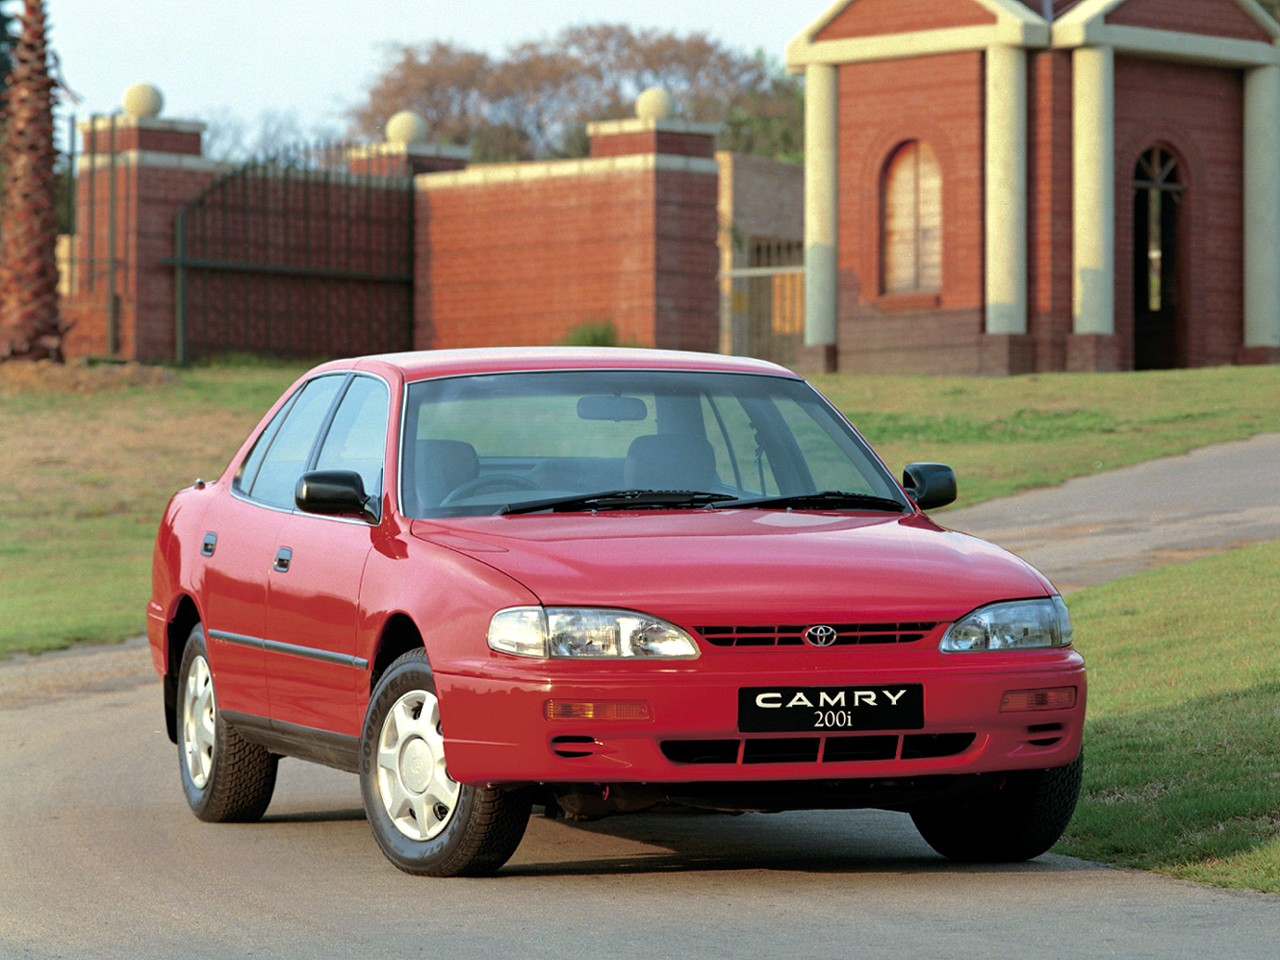 Toyota Camry Specs Photos 1991 1992 1993 1994 1995 1996 91 2 0 Engine Diagram